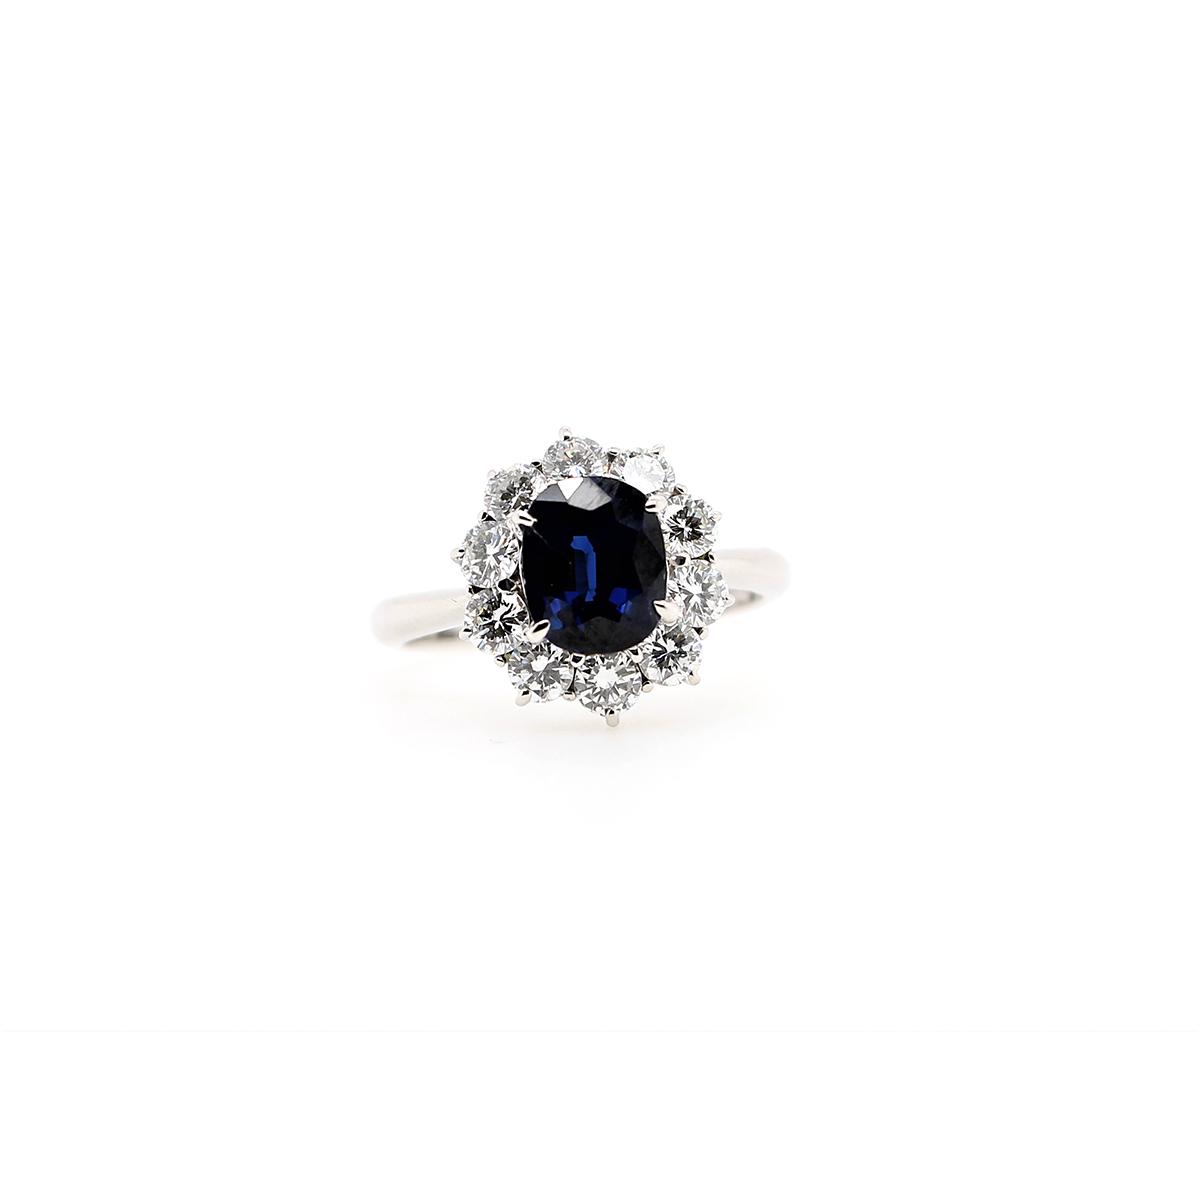 Vintage Platinum Oval Blue Sapphire and Diamond Ring